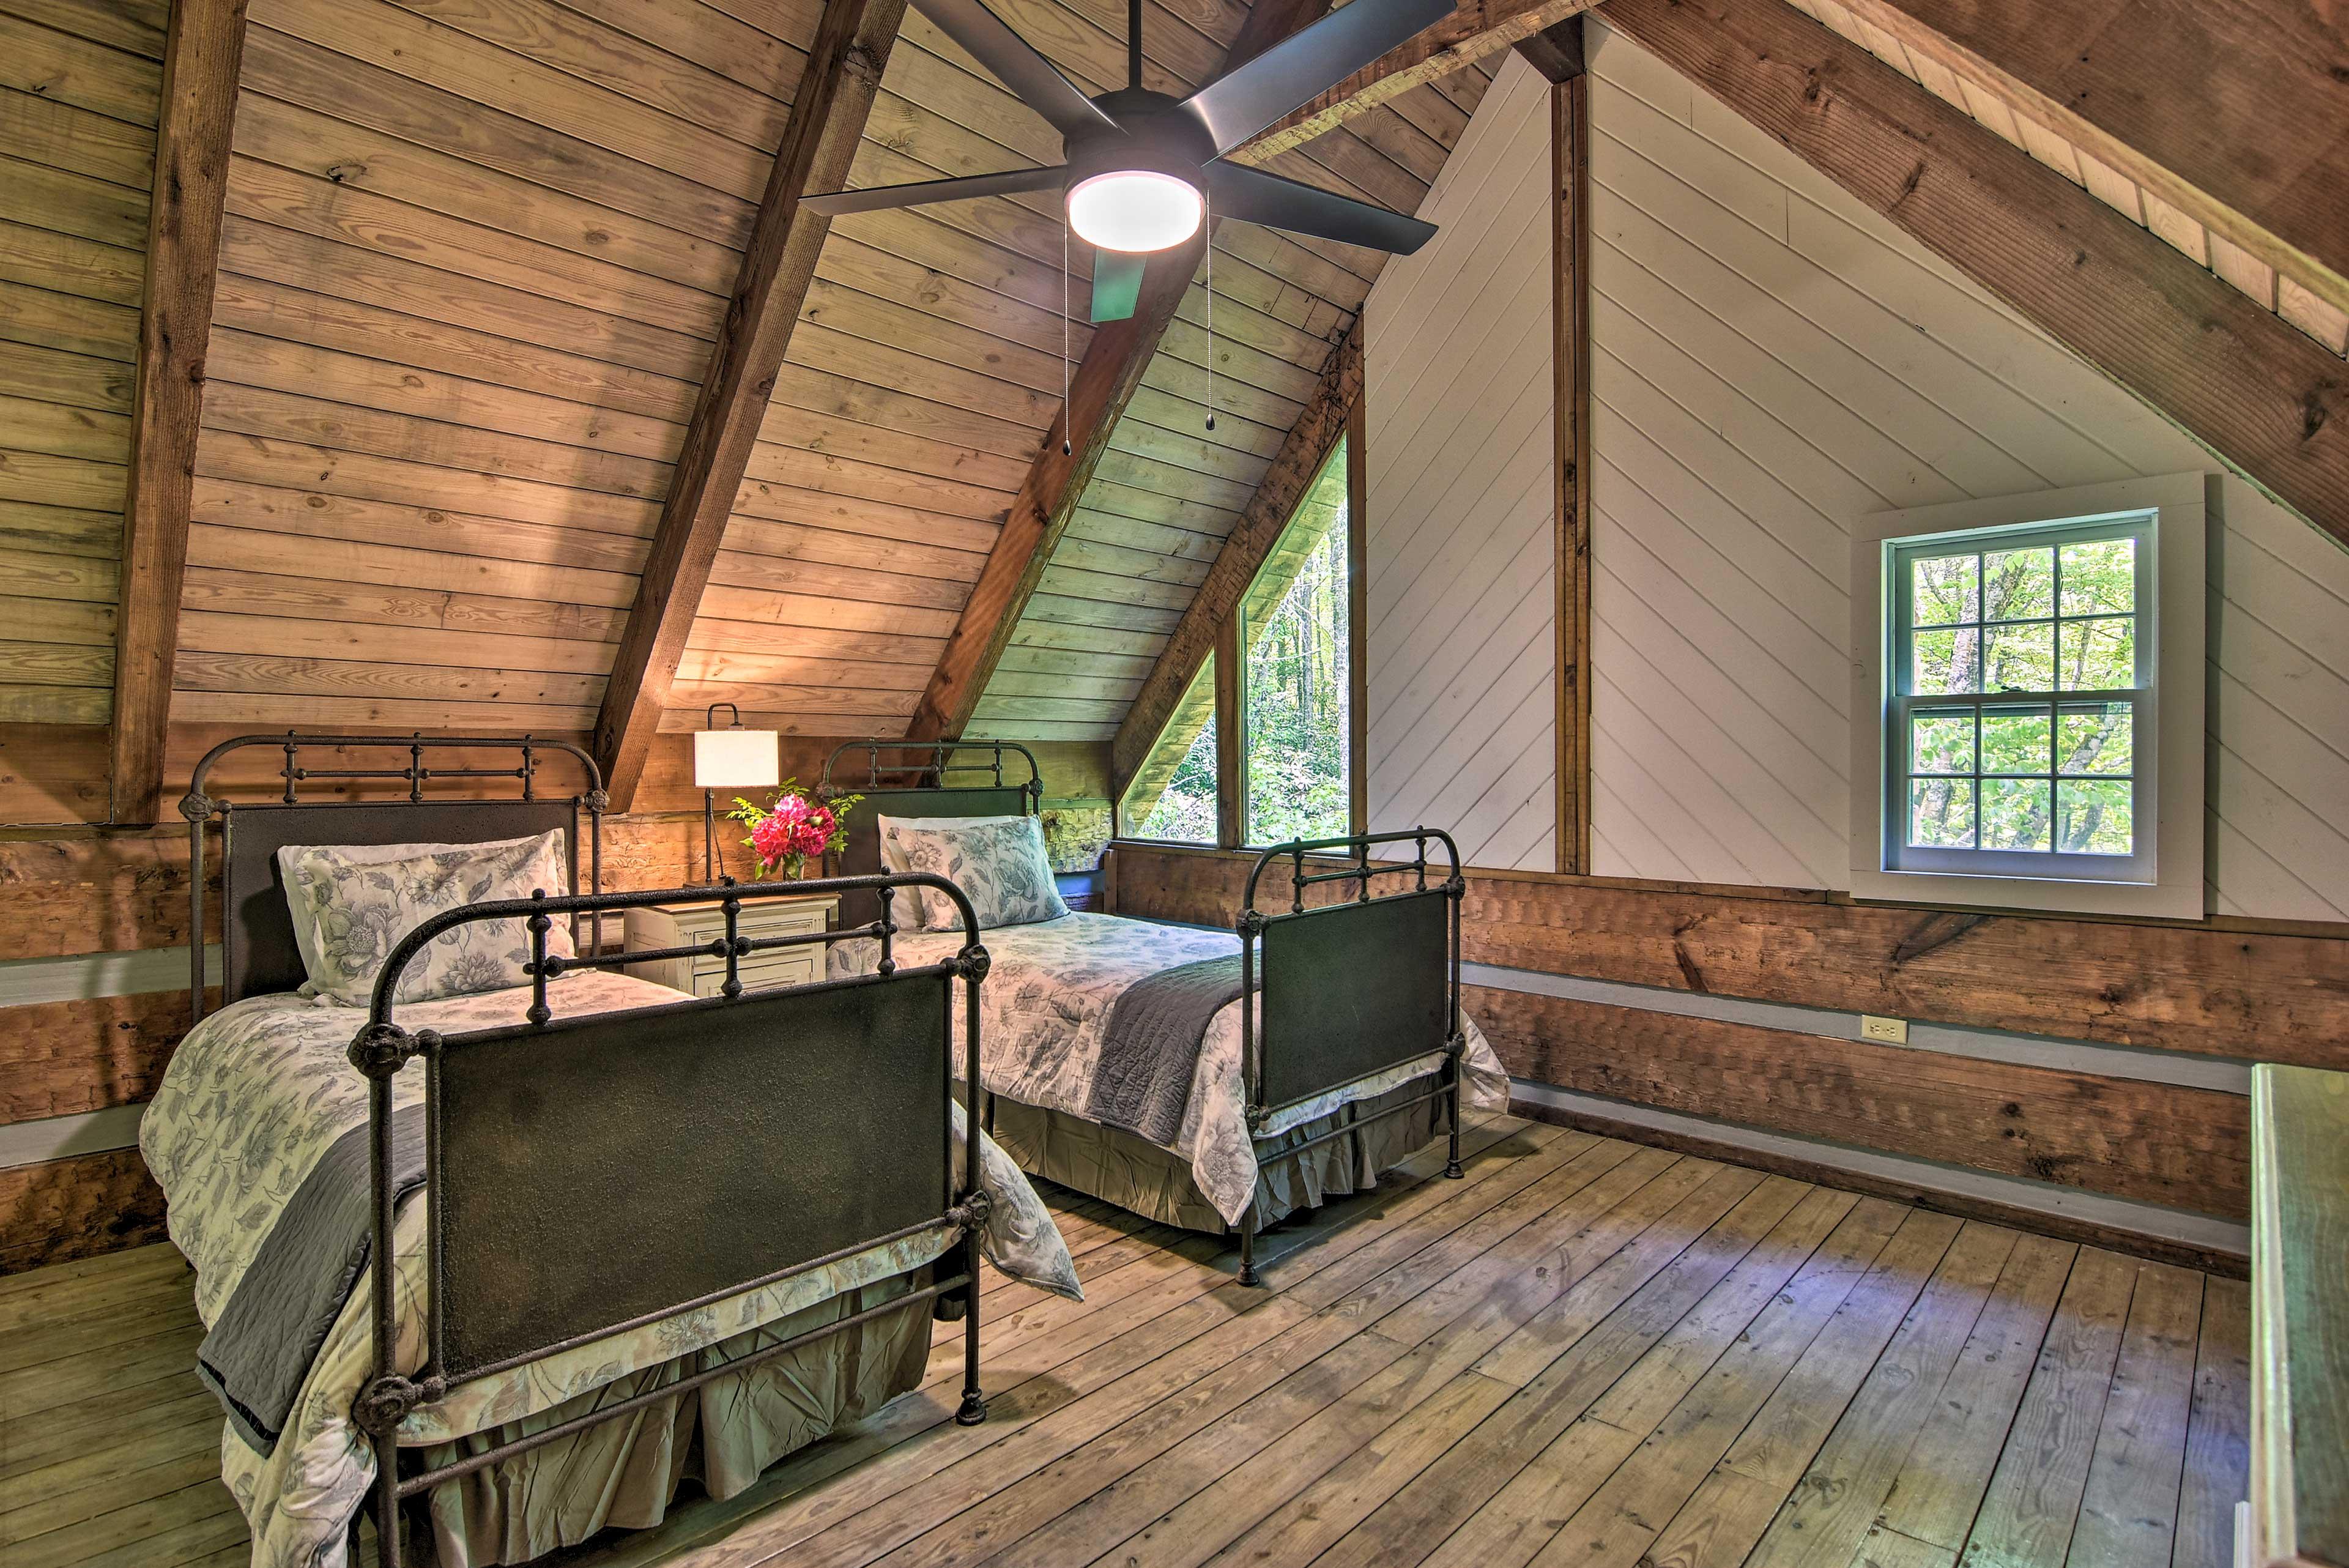 This stylish room sleeps 2 with twin beds.